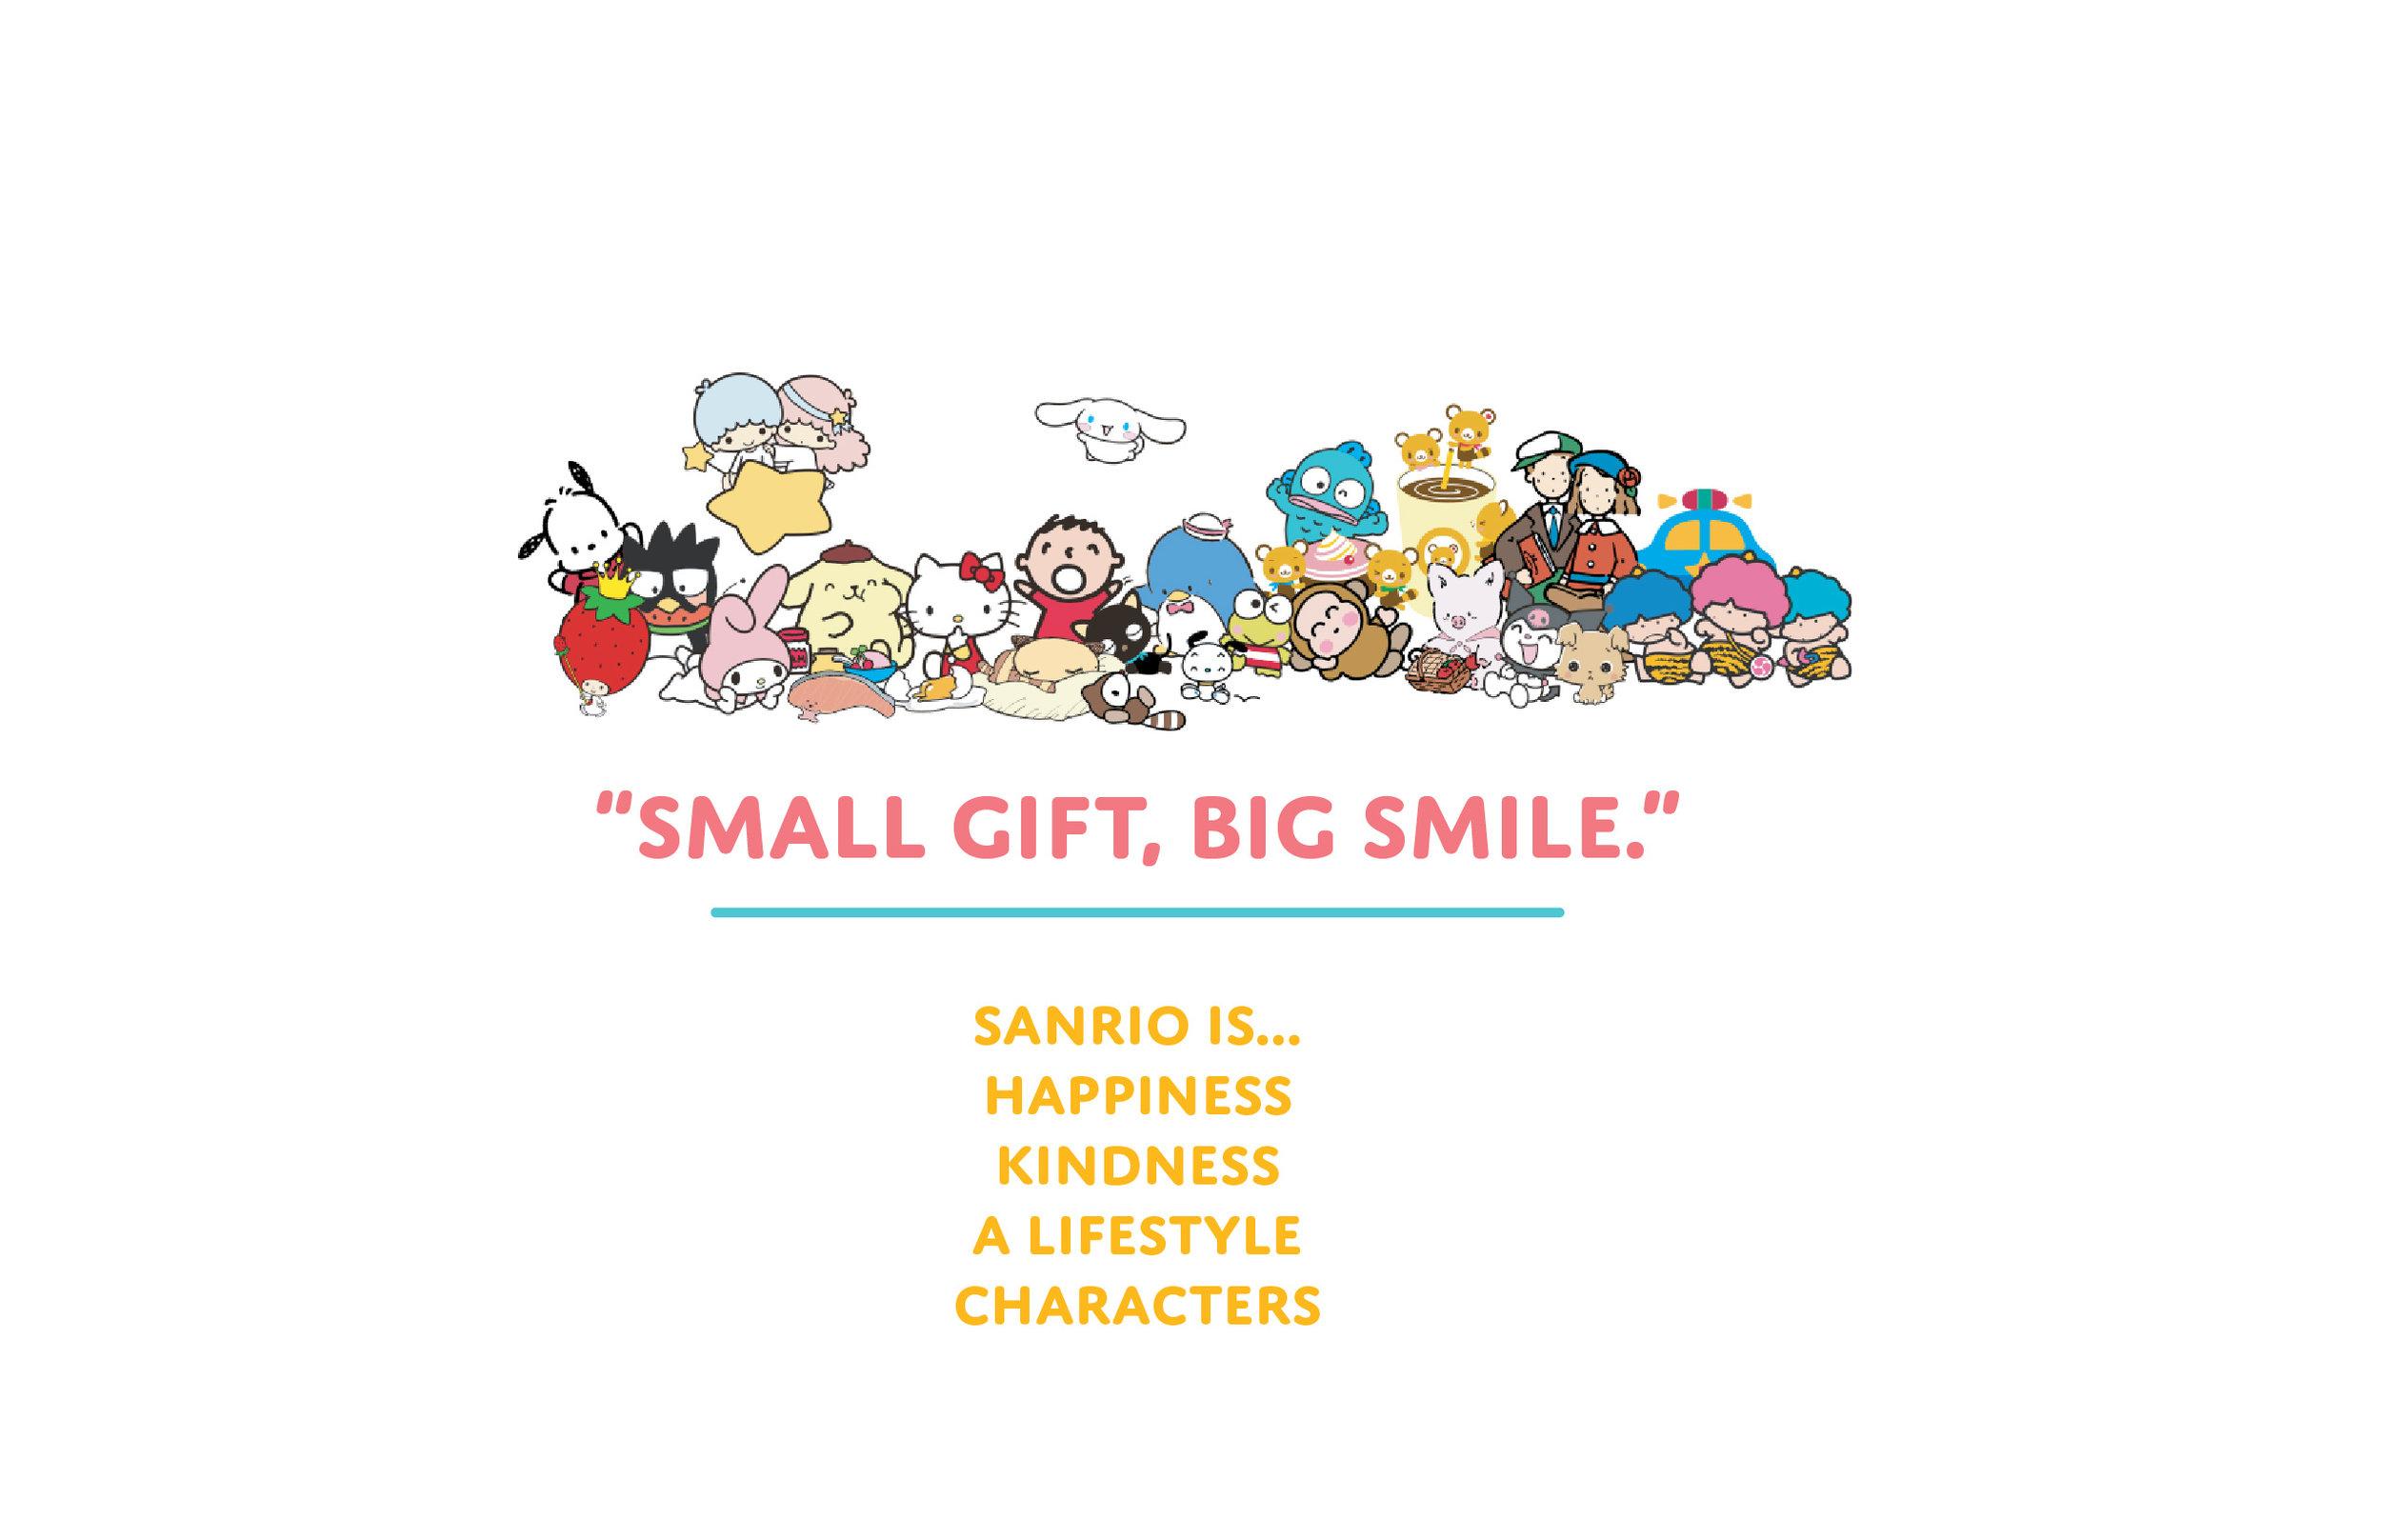 SANRIO_STORY-02.jpg